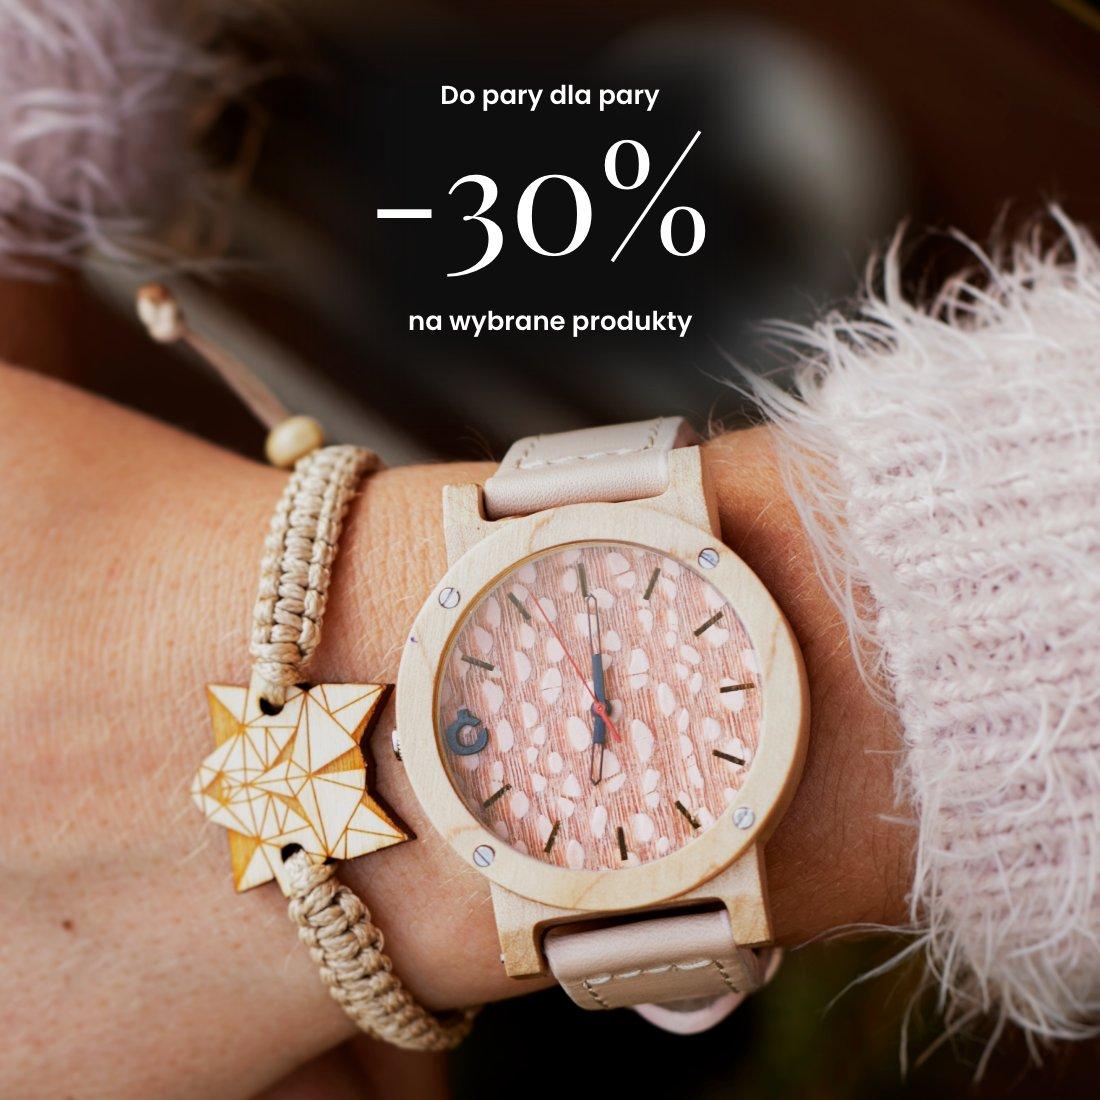 LP_promocja_do_pary_-30%_1100x1100